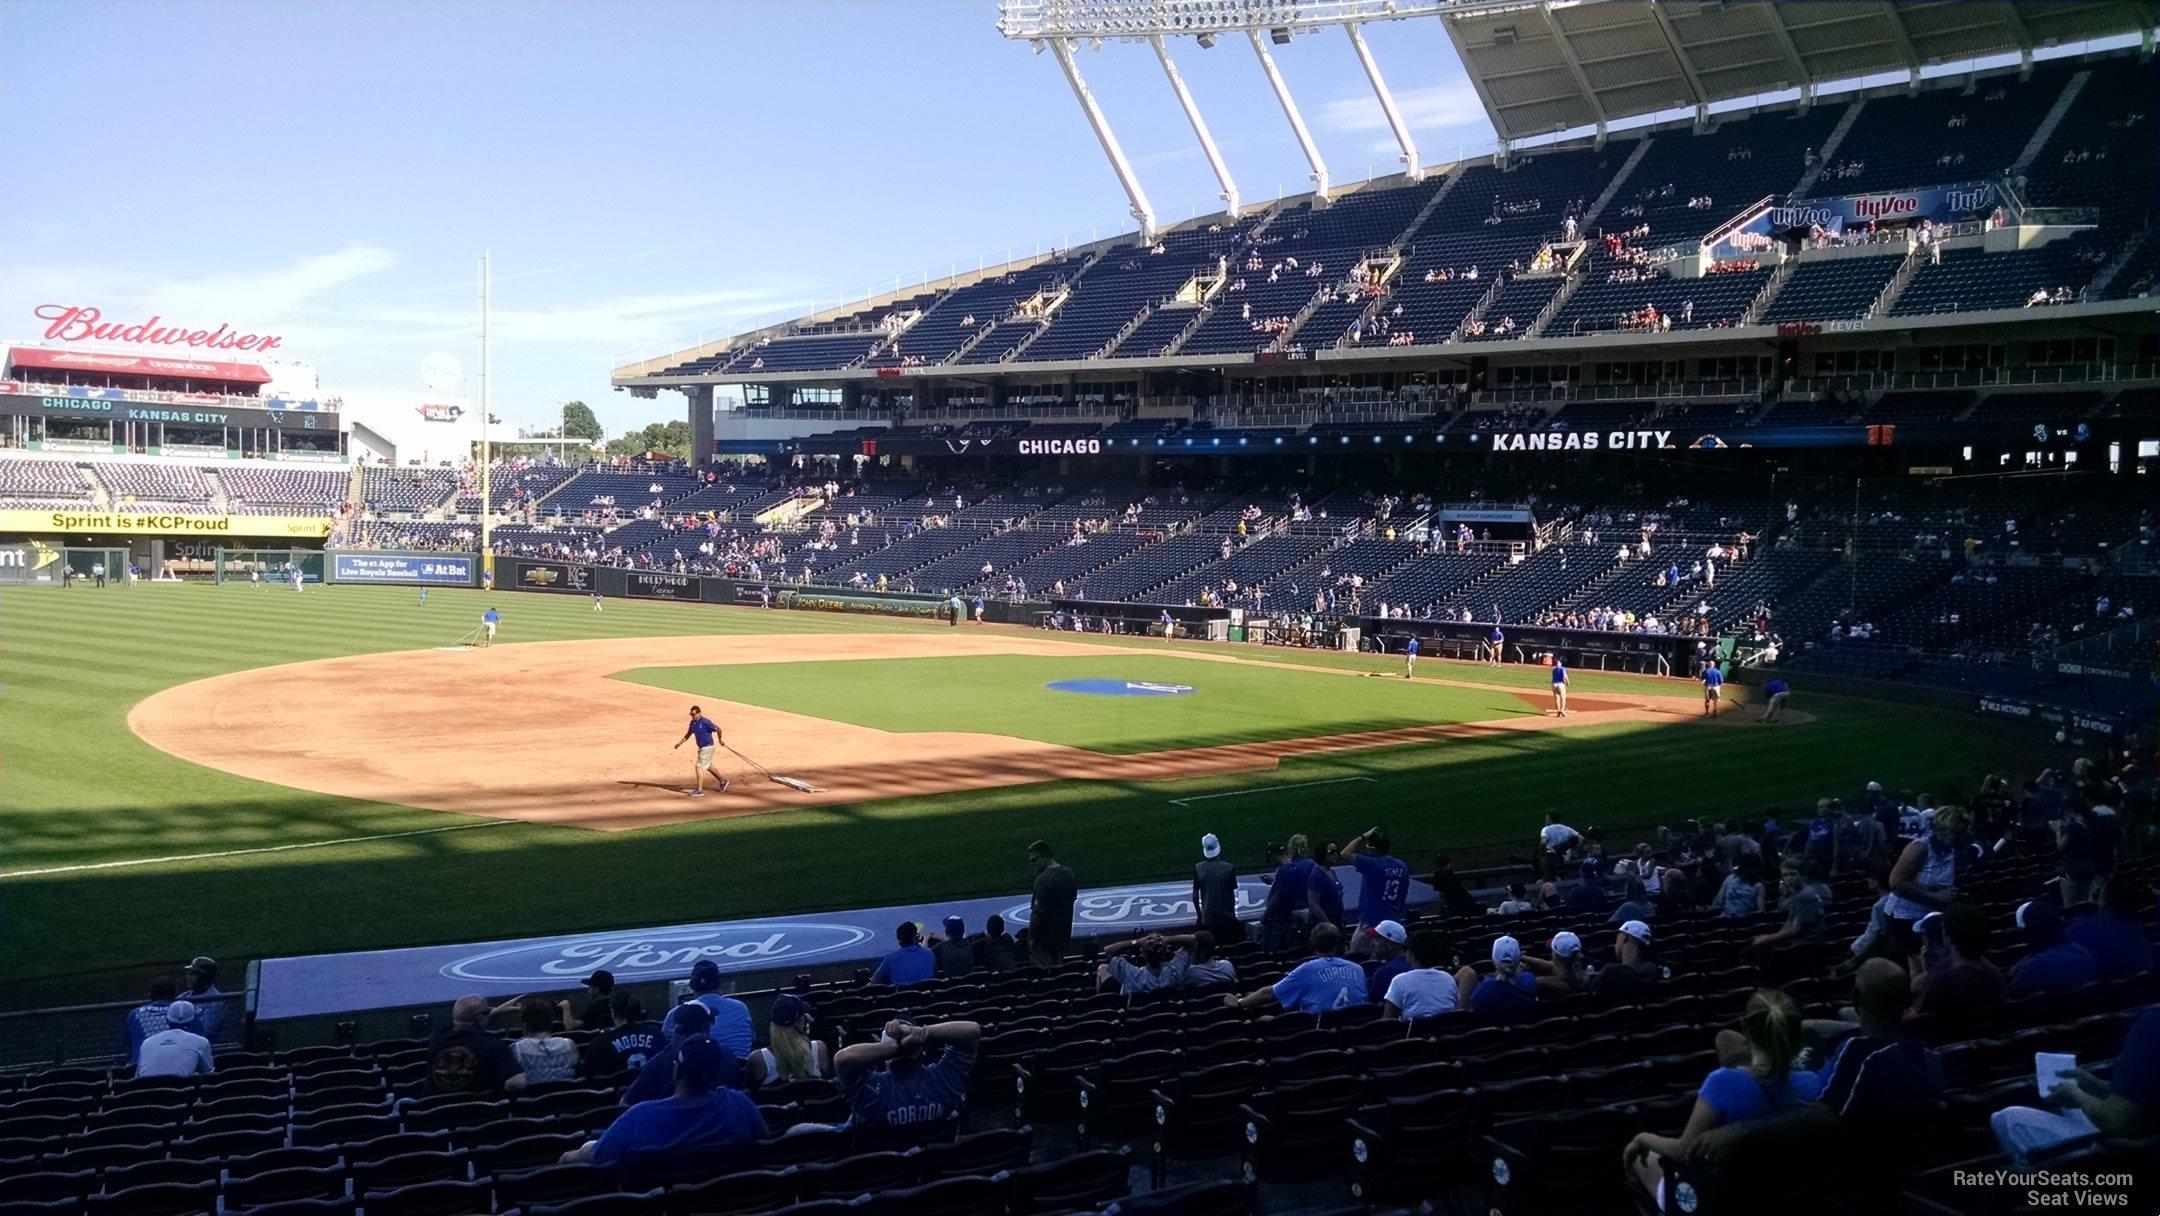 Kauffman Stadium Section 116 - RateYourSeats.com